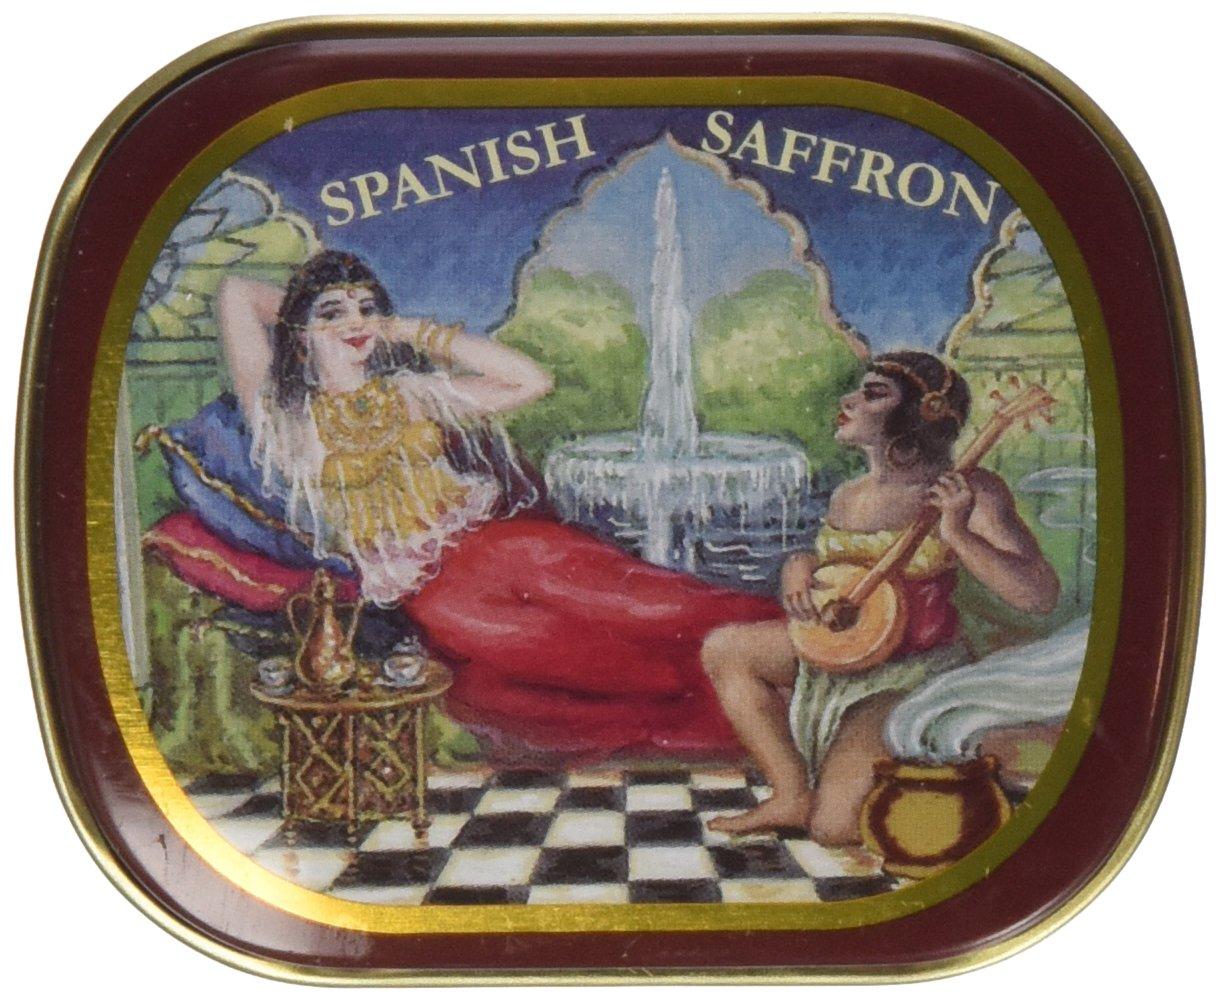 Spanish Saffron Tin 1 Gram by Alma Gourmet